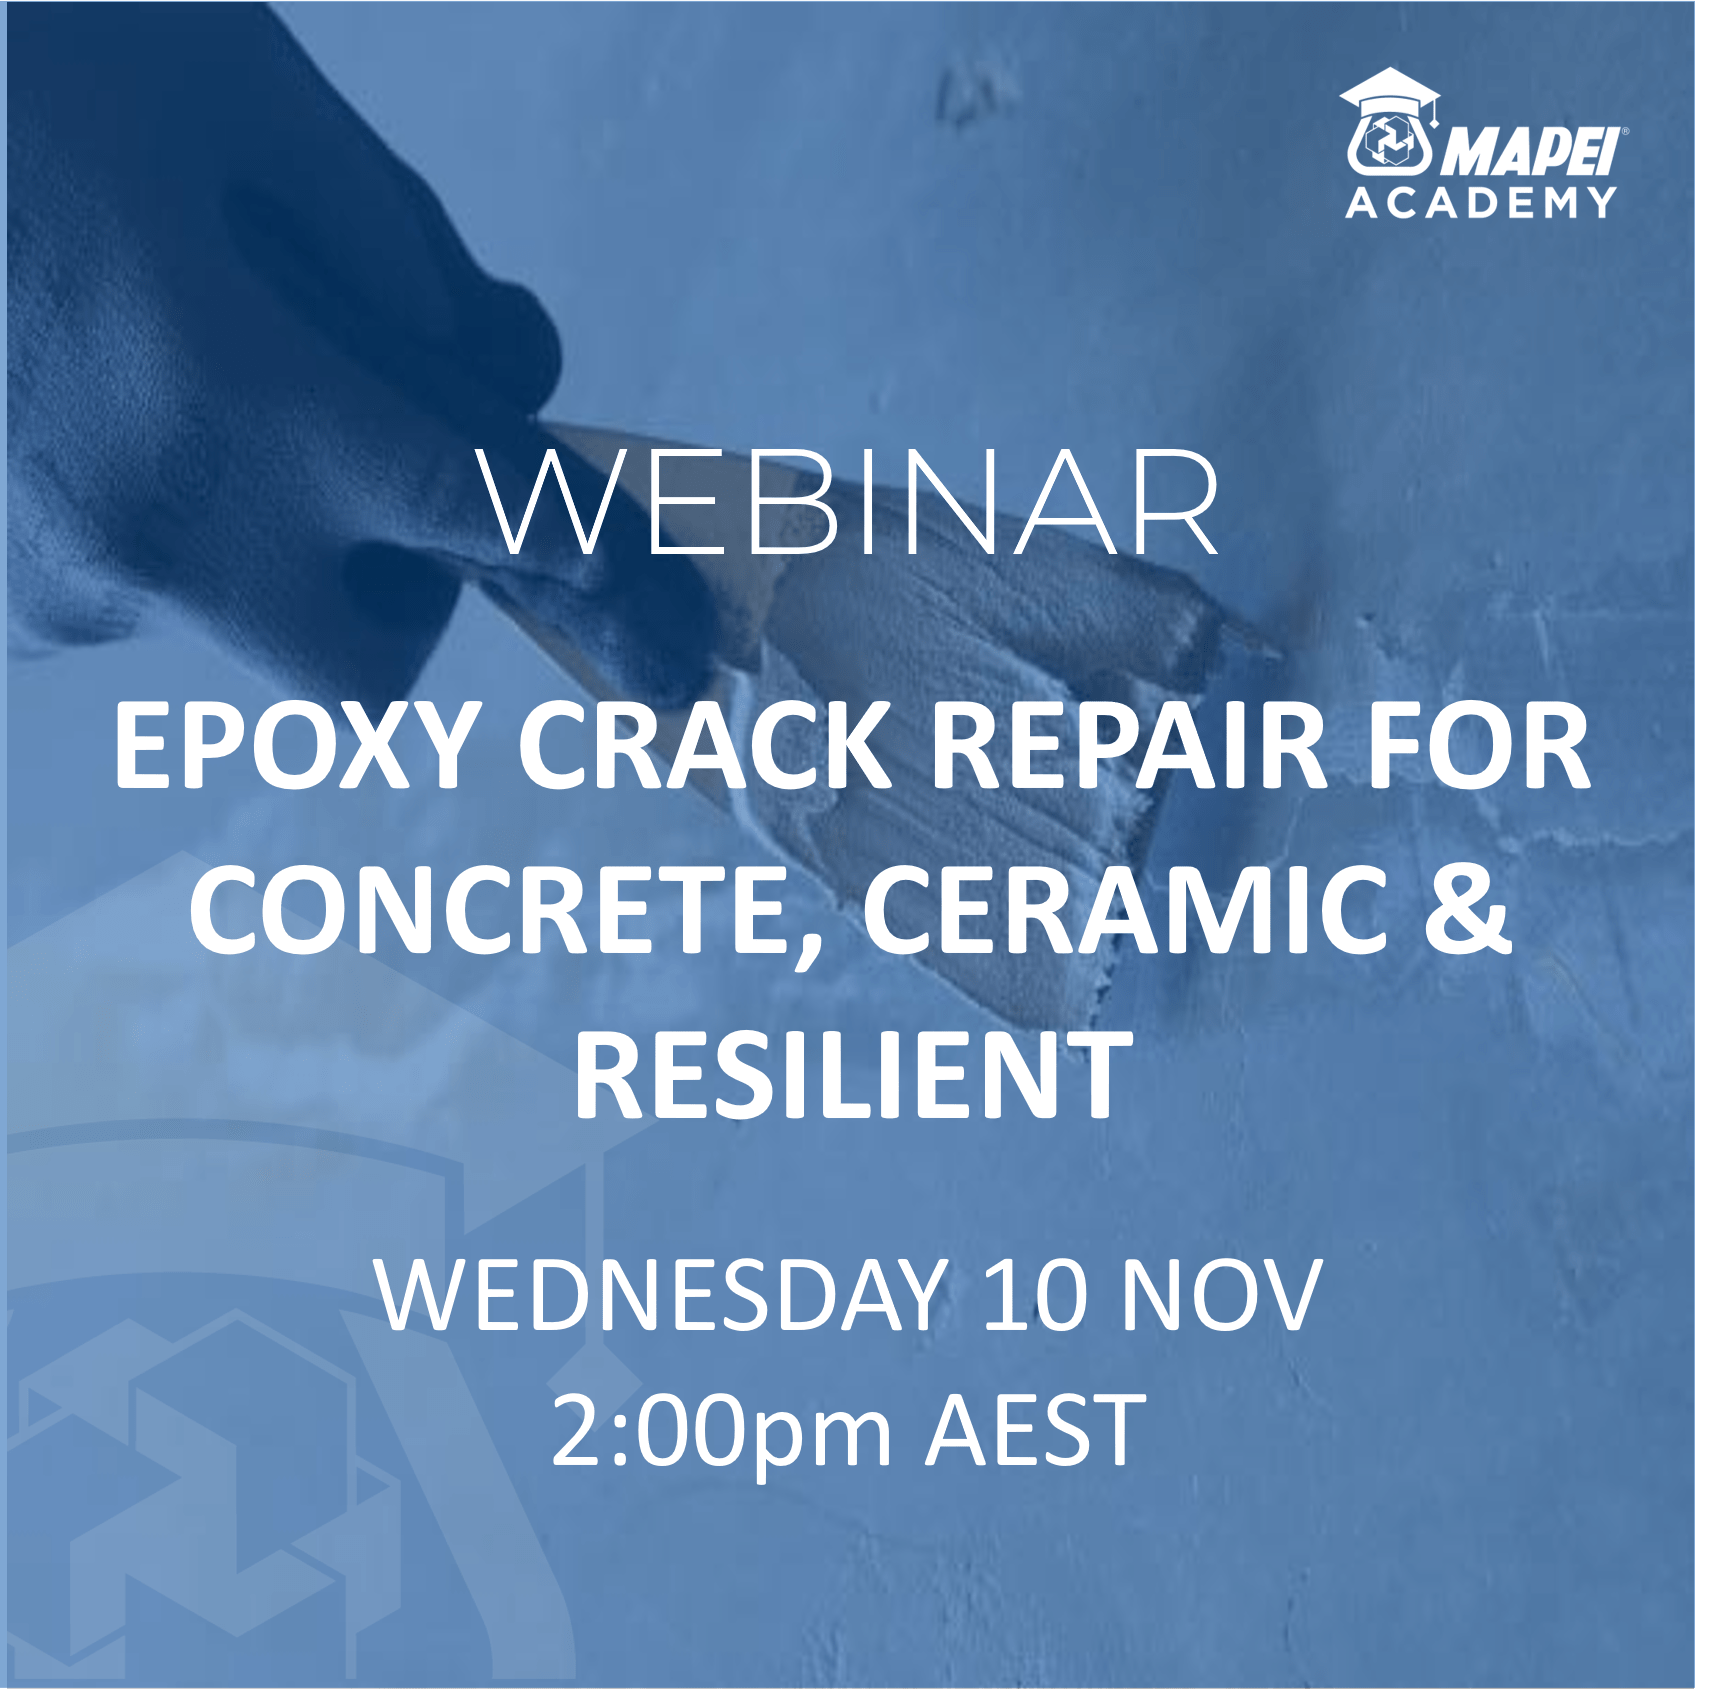 Magnews - Epoxy Crack Repair for Concrete, Ceramic, & Resilient-min